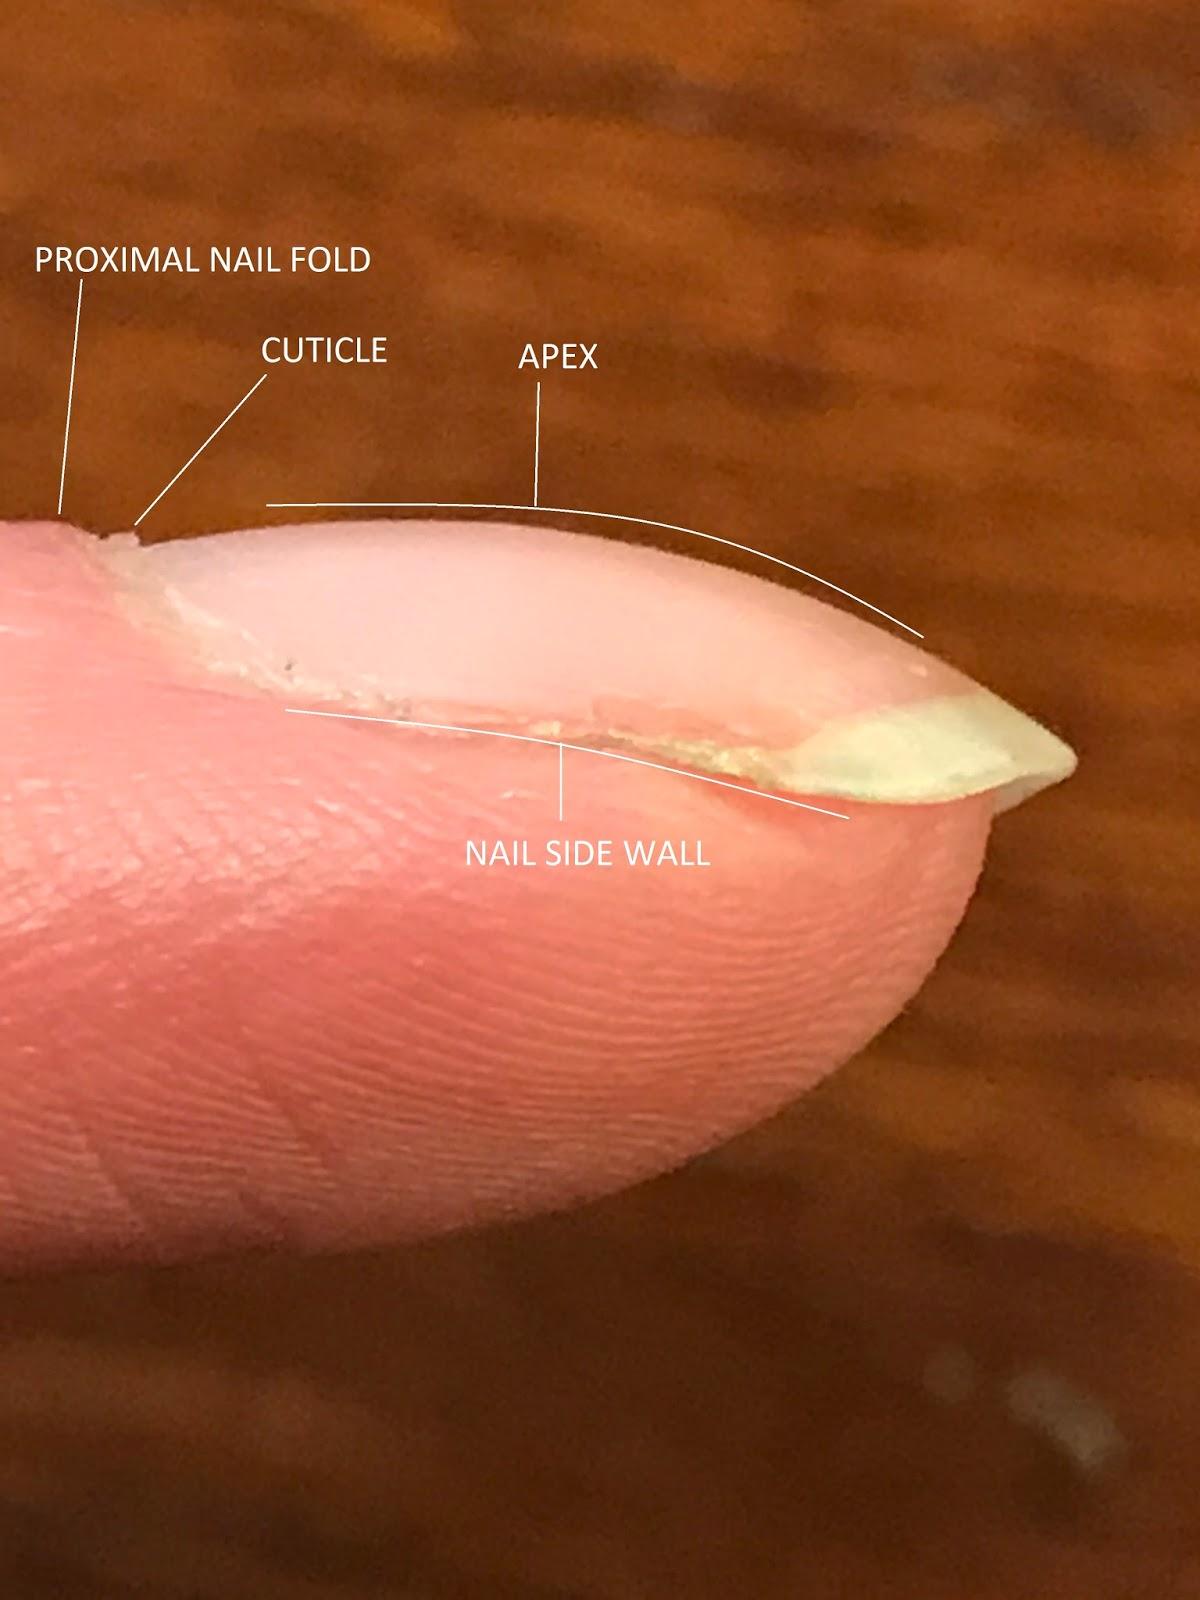 MadameRedd: Anatomy of a Nail + Basic Care